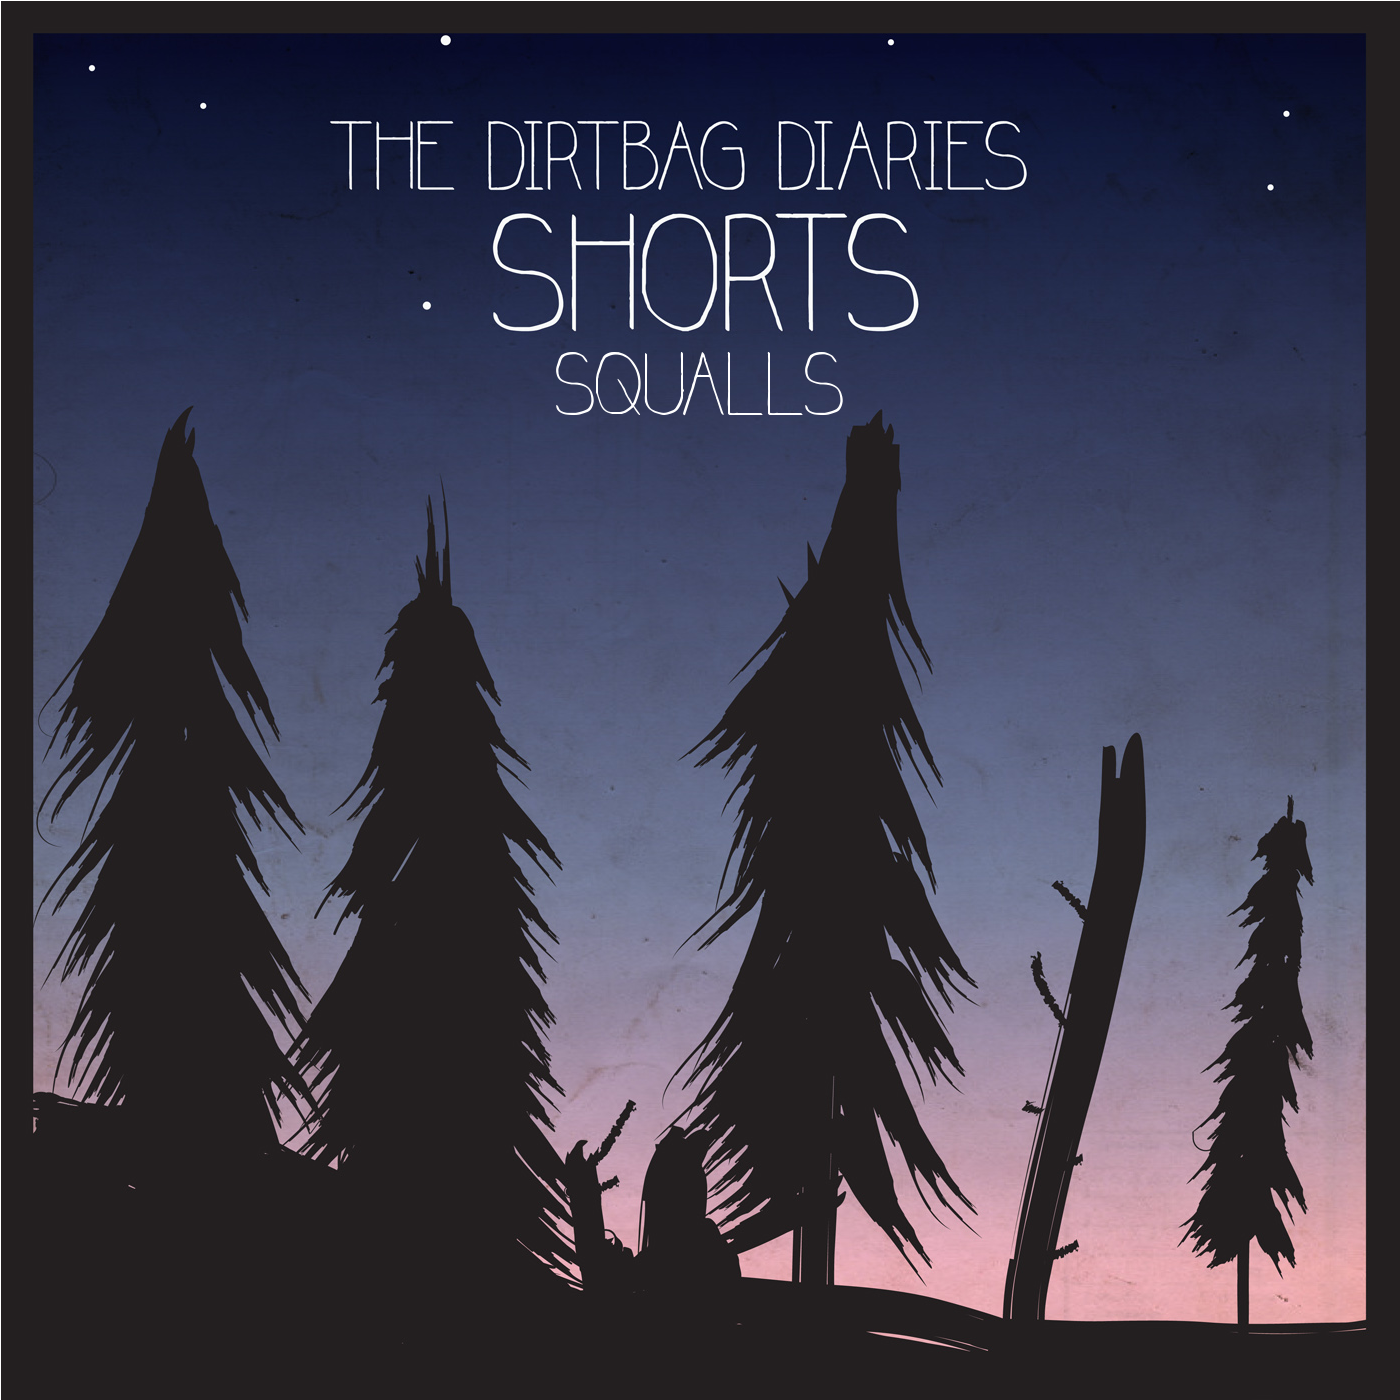 The Shorts--Squalls